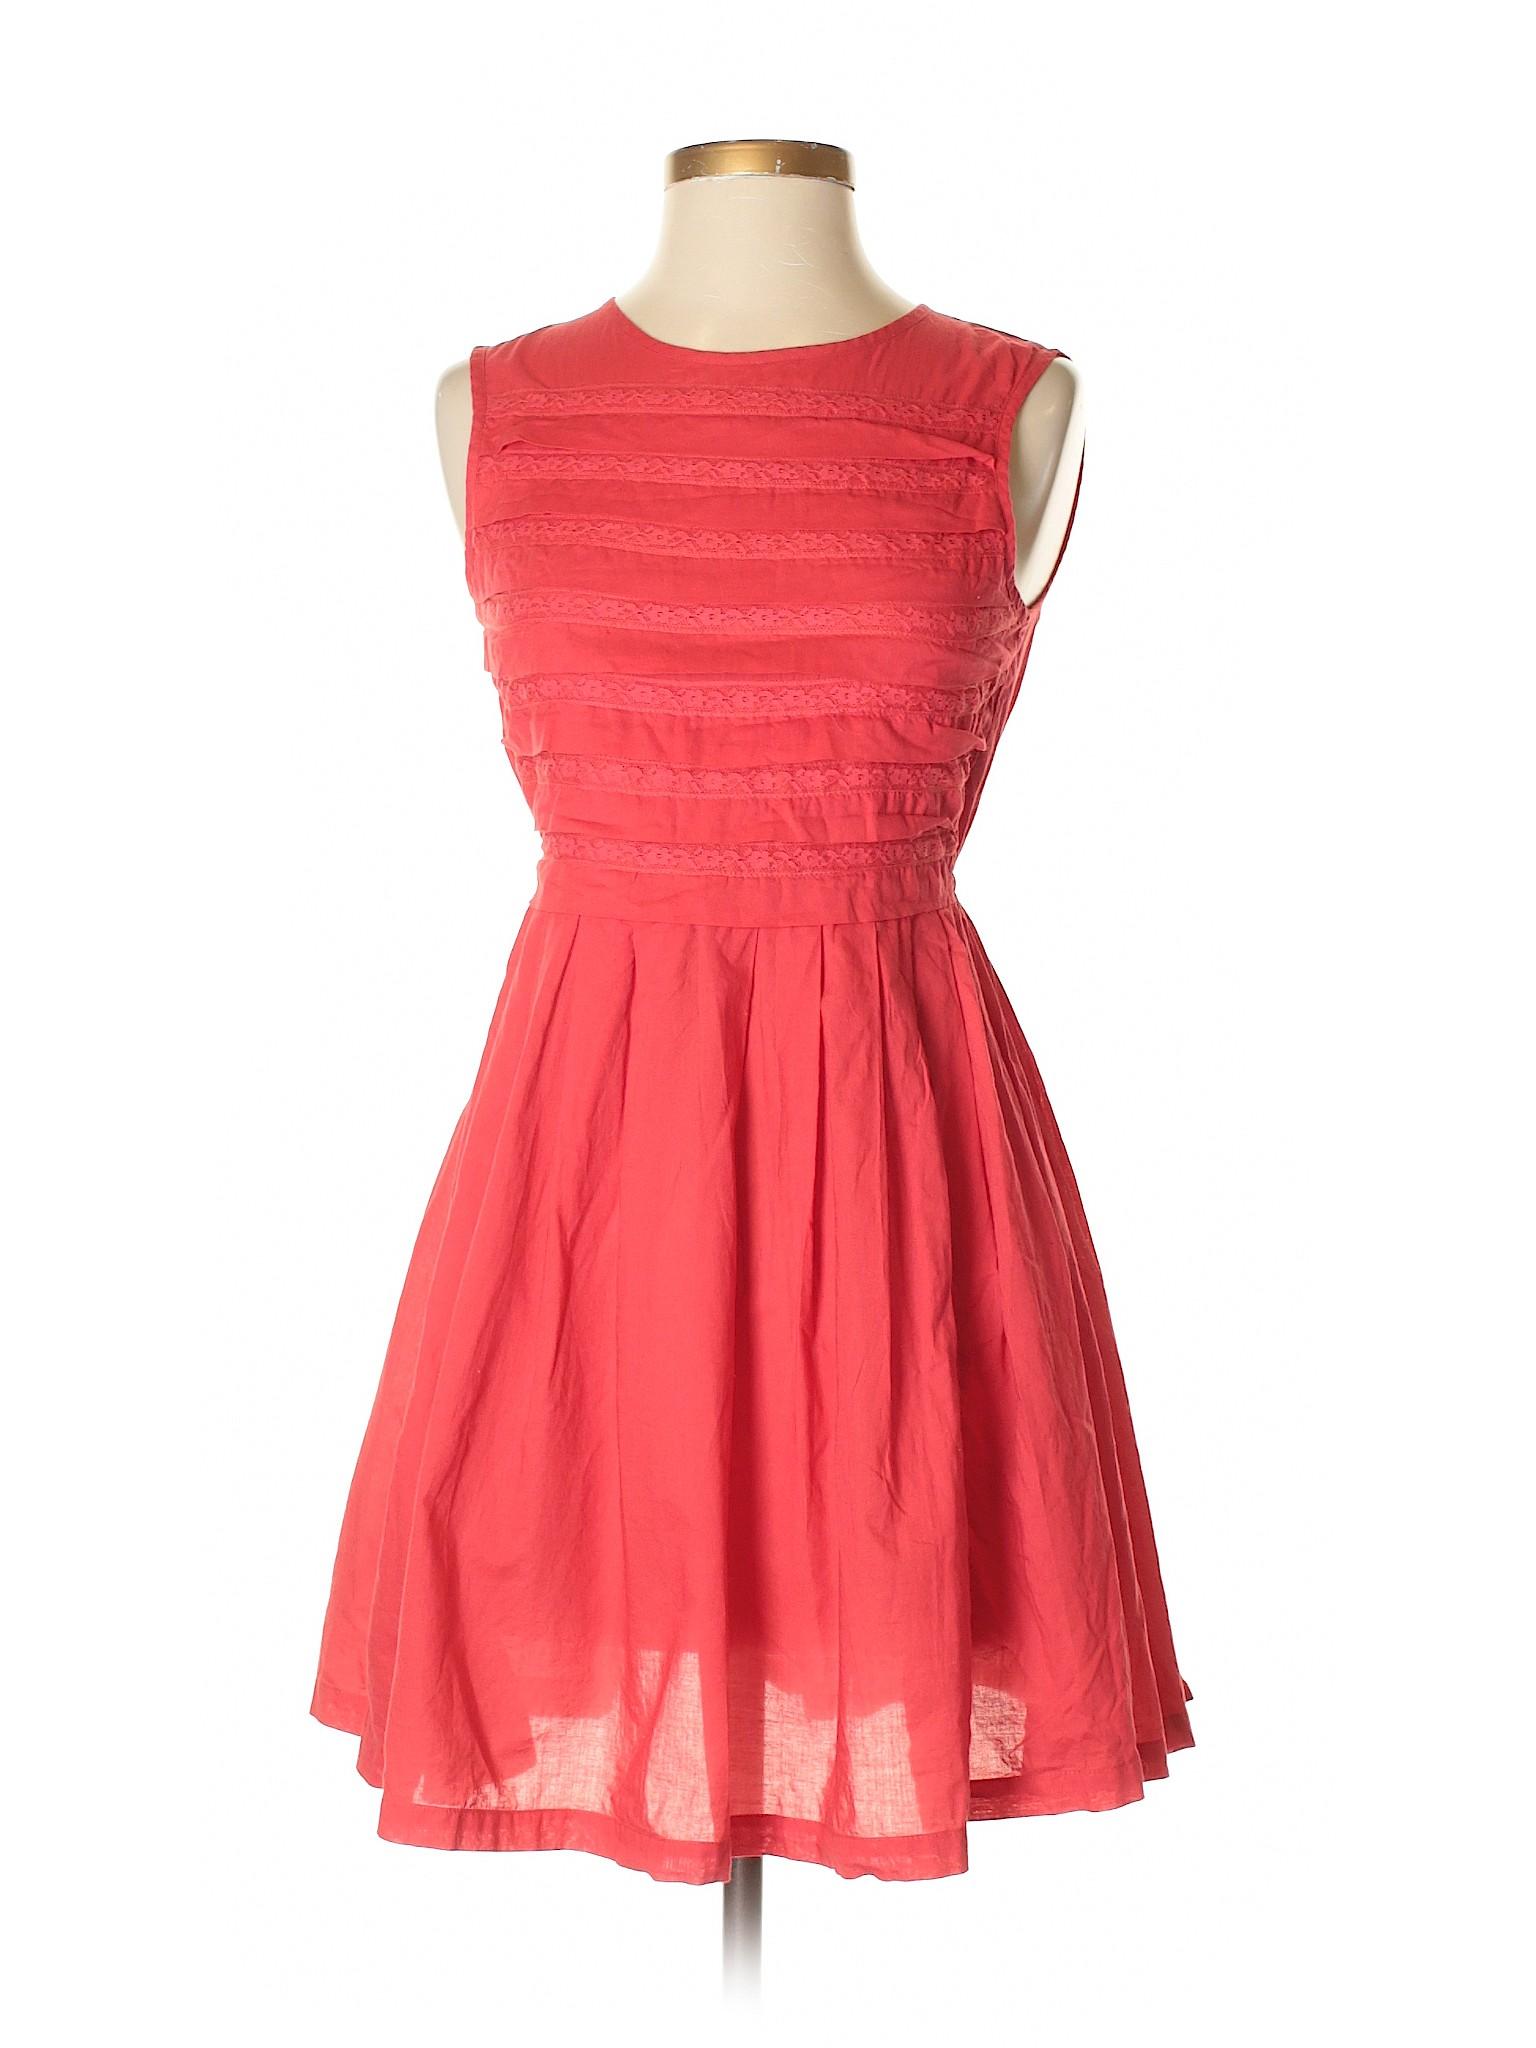 Casual Boutique winter ASOS ASOS Dress Dress Boutique winter winter ASOS winter Boutique Casual Dress Casual Boutique OPCqXxST